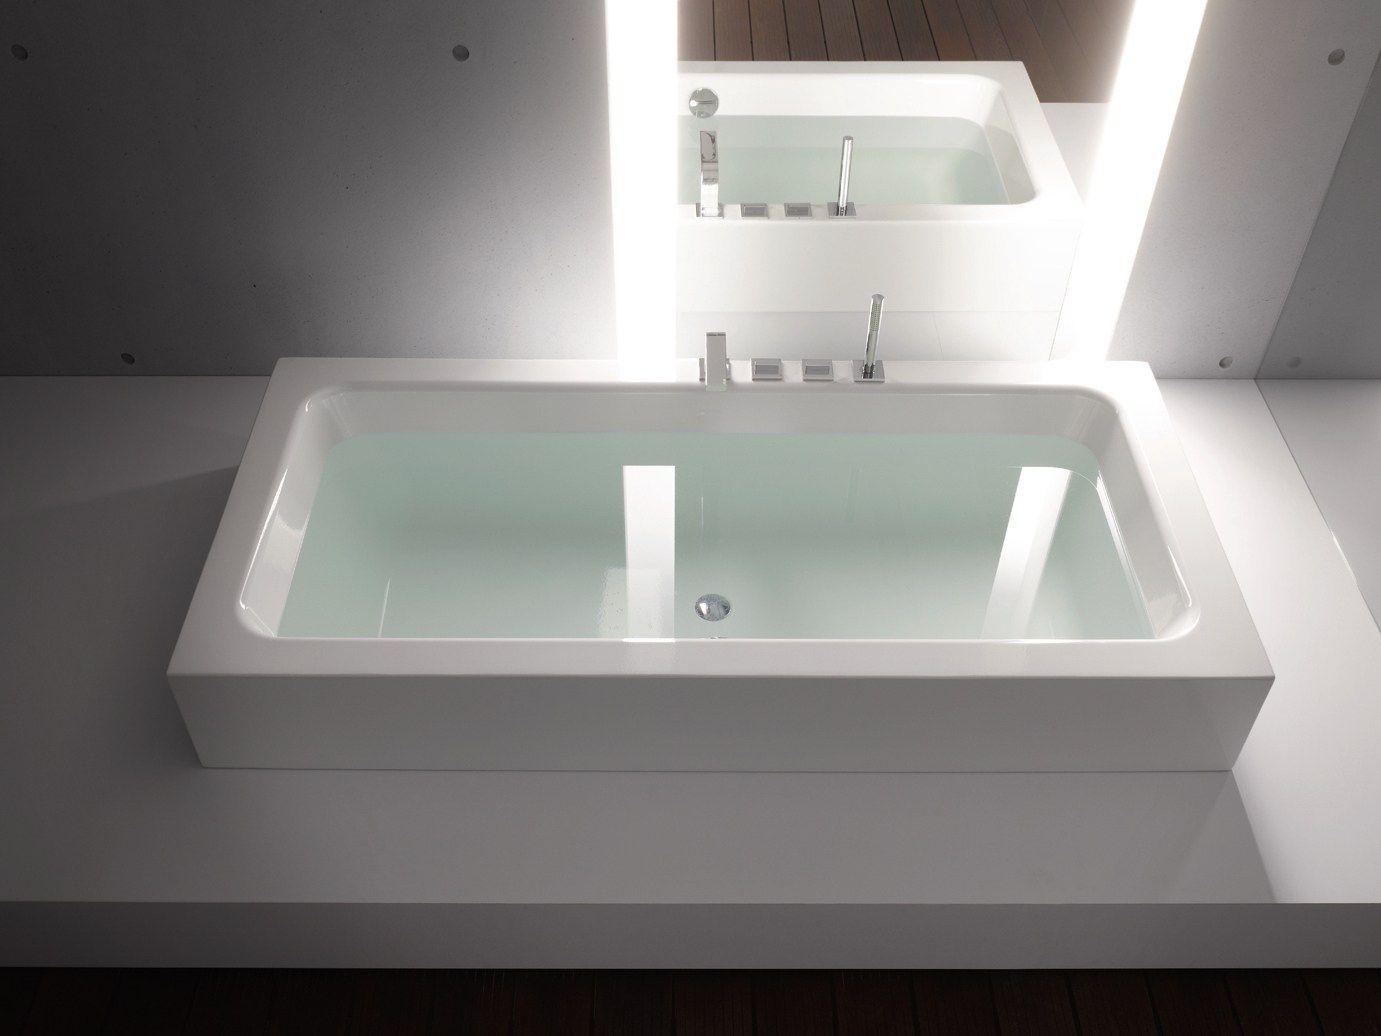 baignoire semi encastr e betteone highline collection. Black Bedroom Furniture Sets. Home Design Ideas